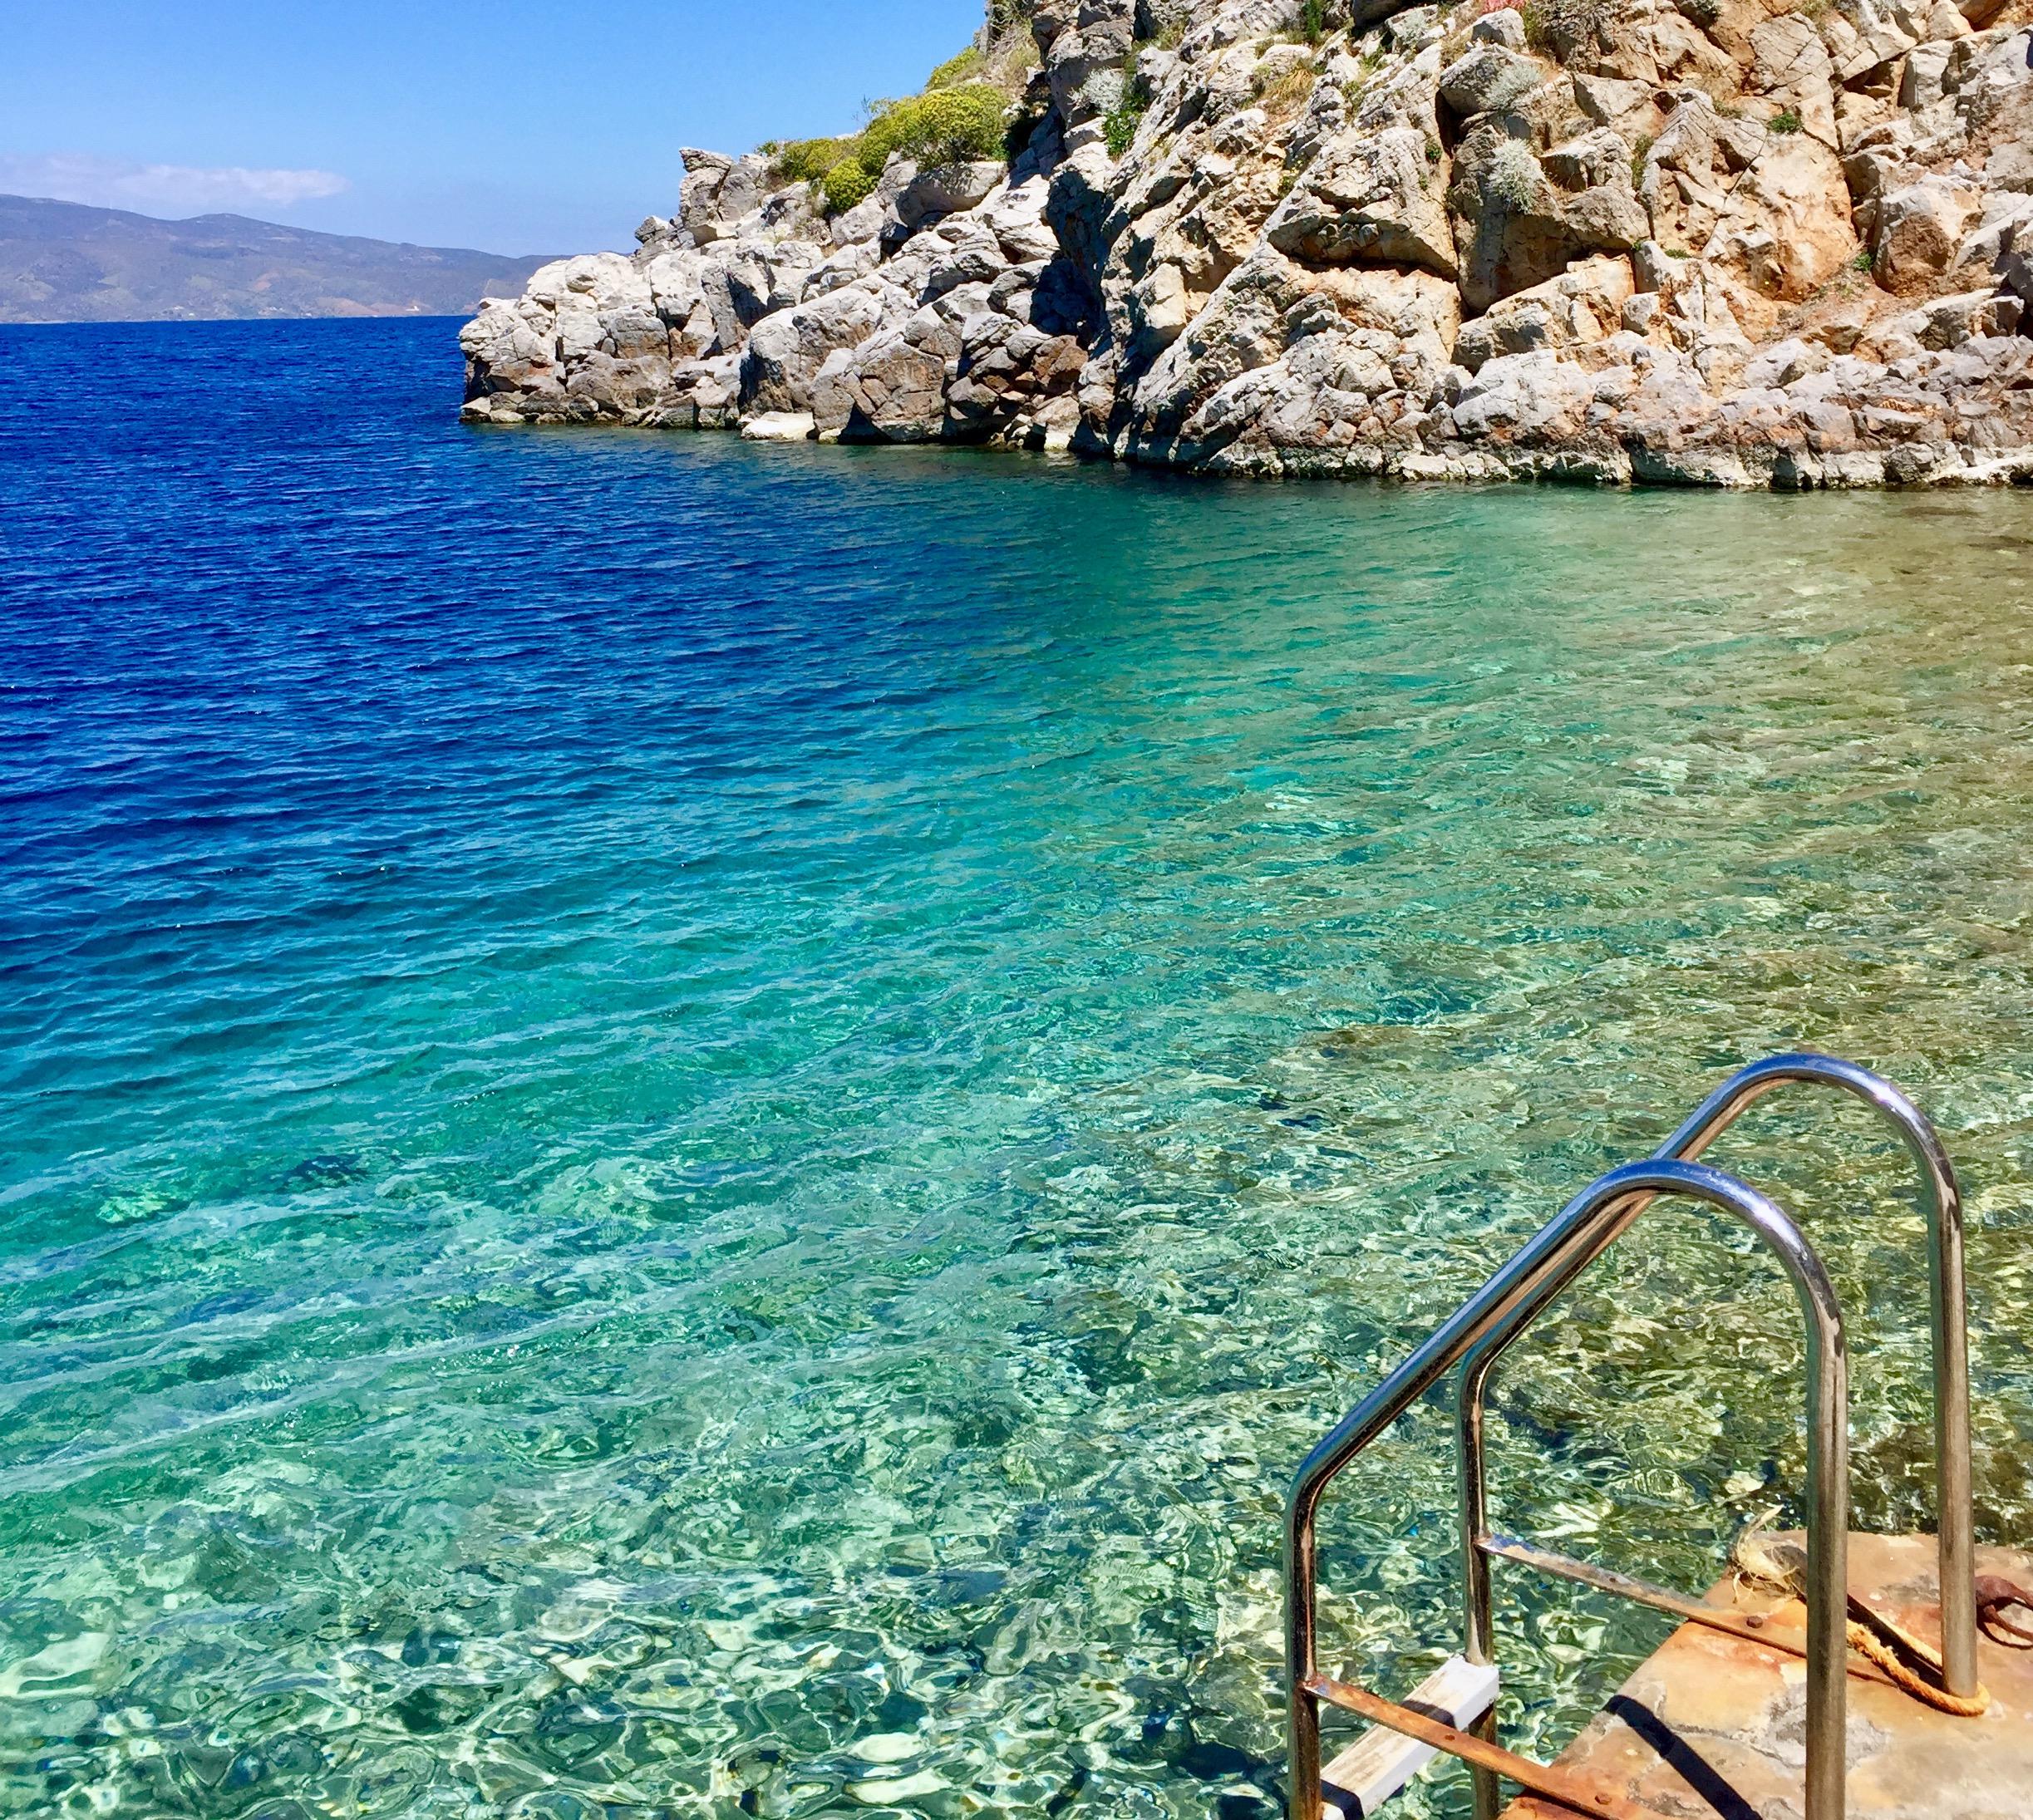 hydra_island_greece_lustforthesublime